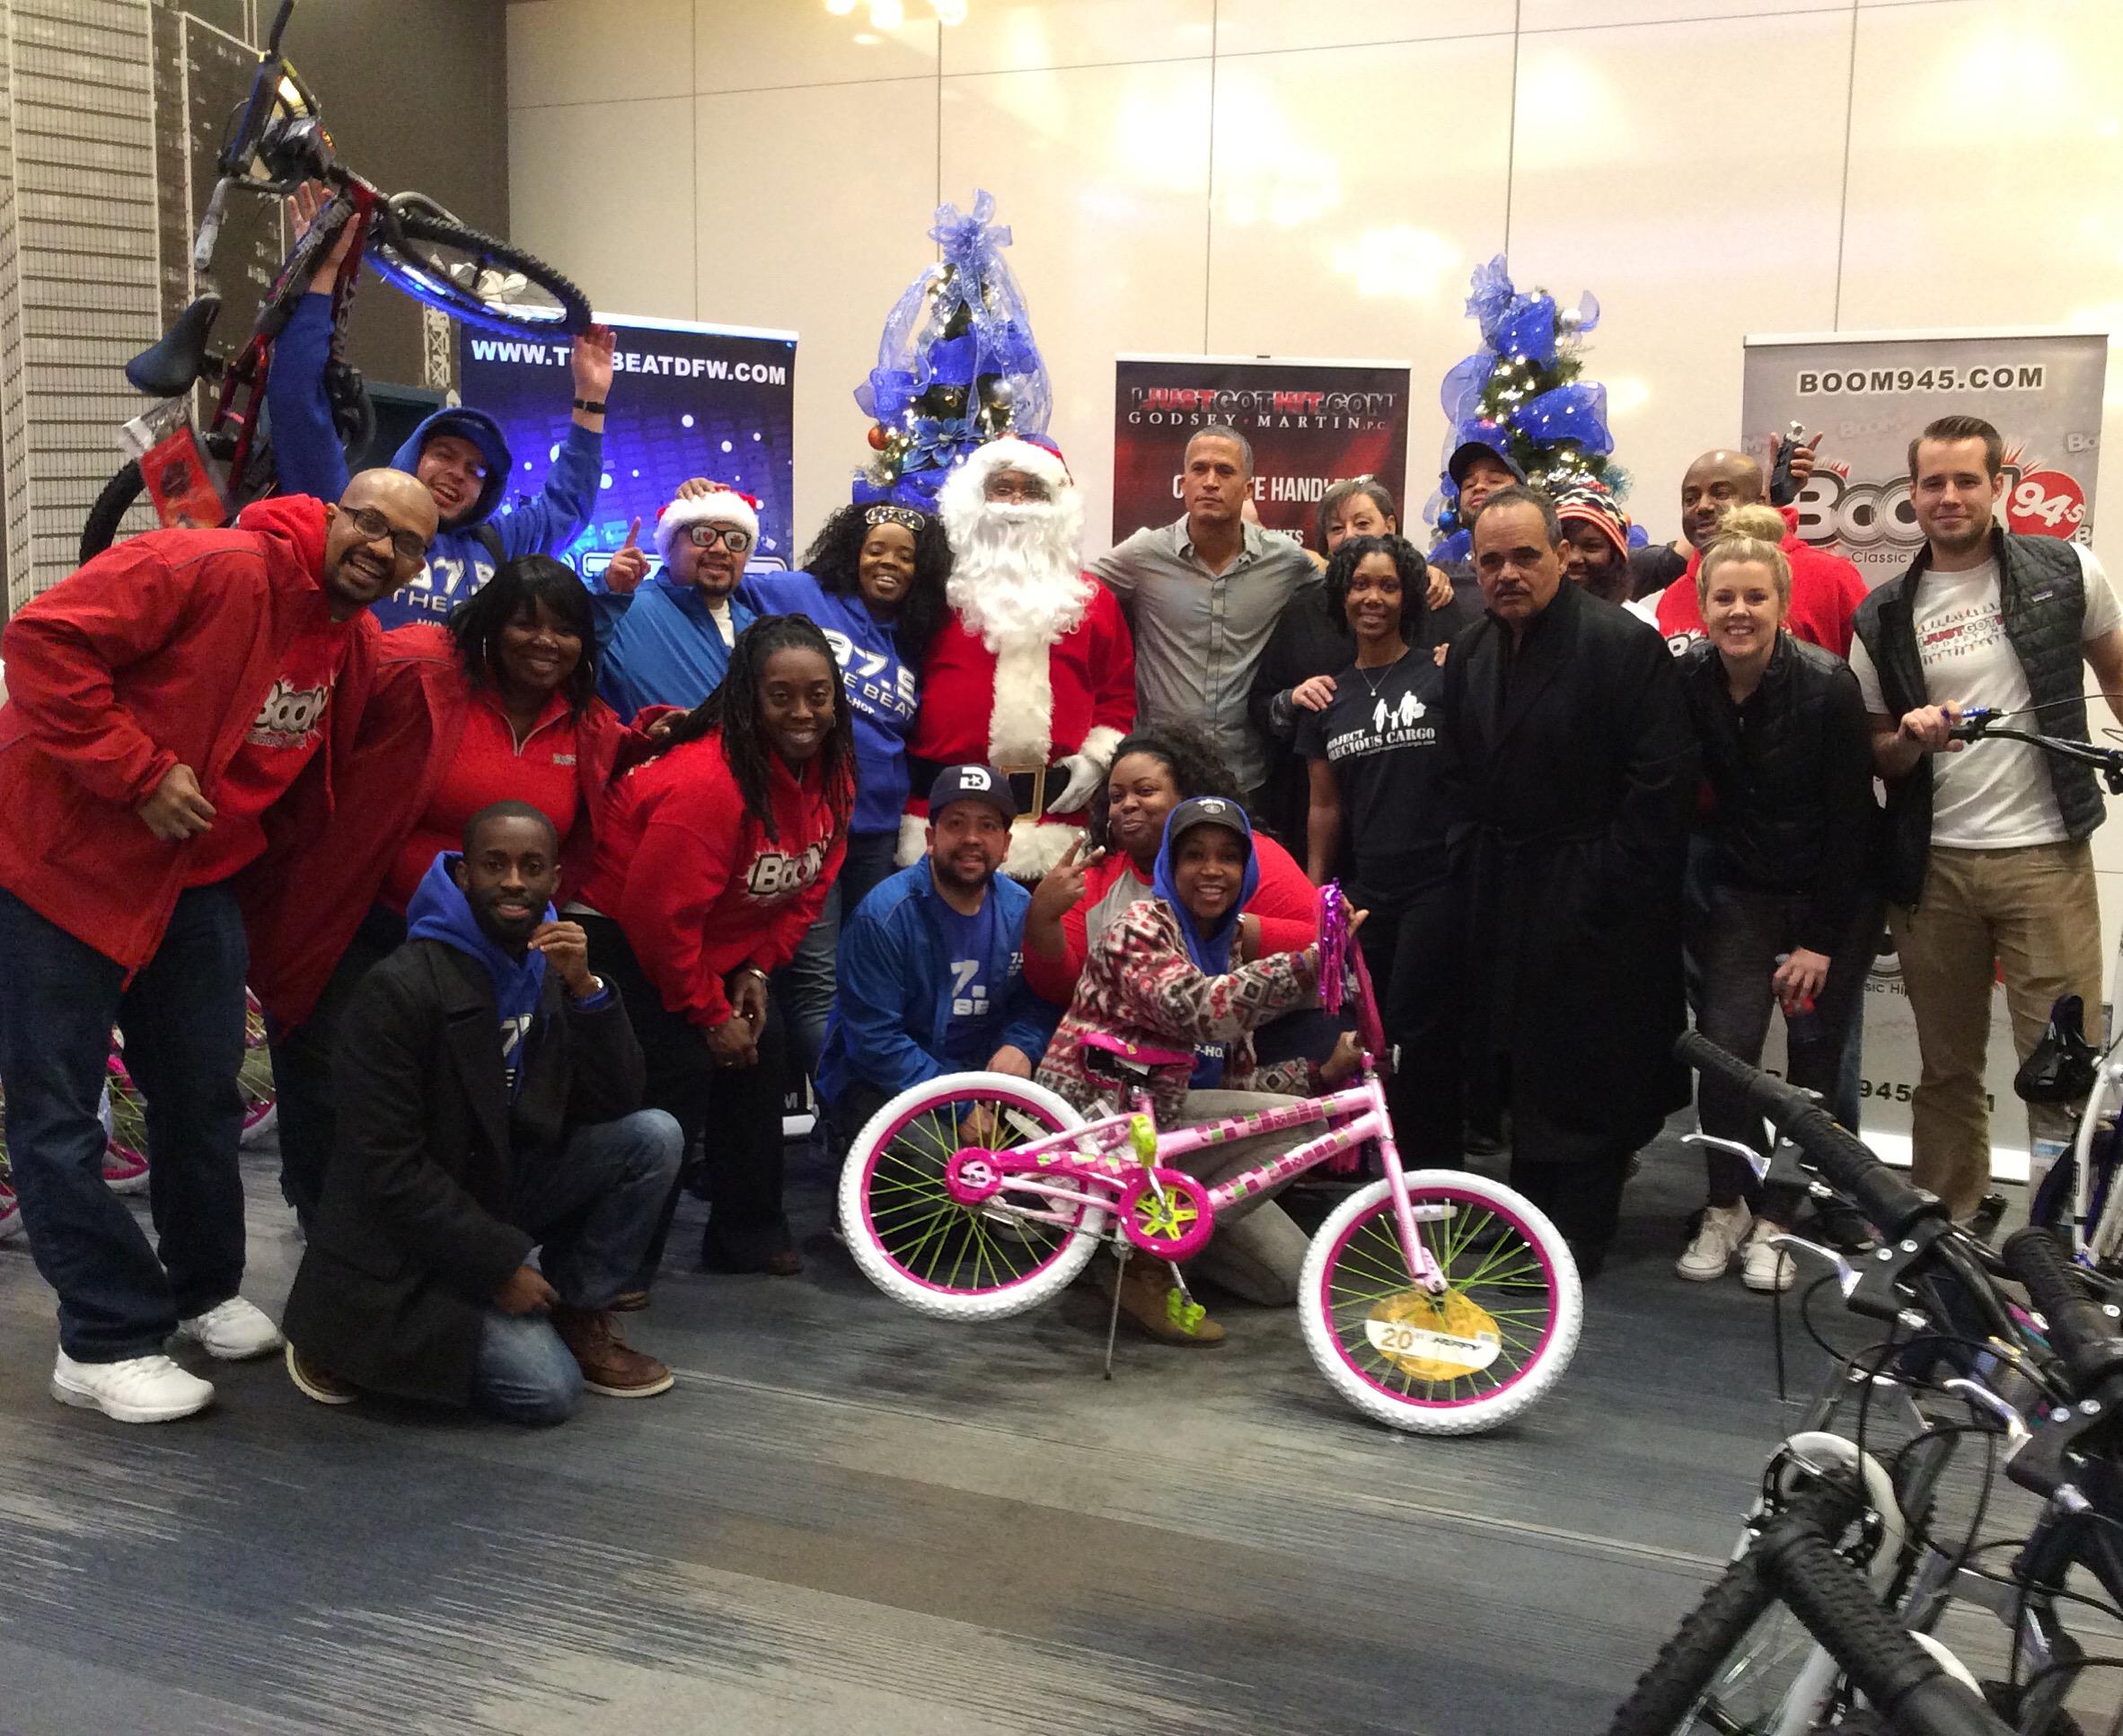 Godsey Martine Bike Giveaway